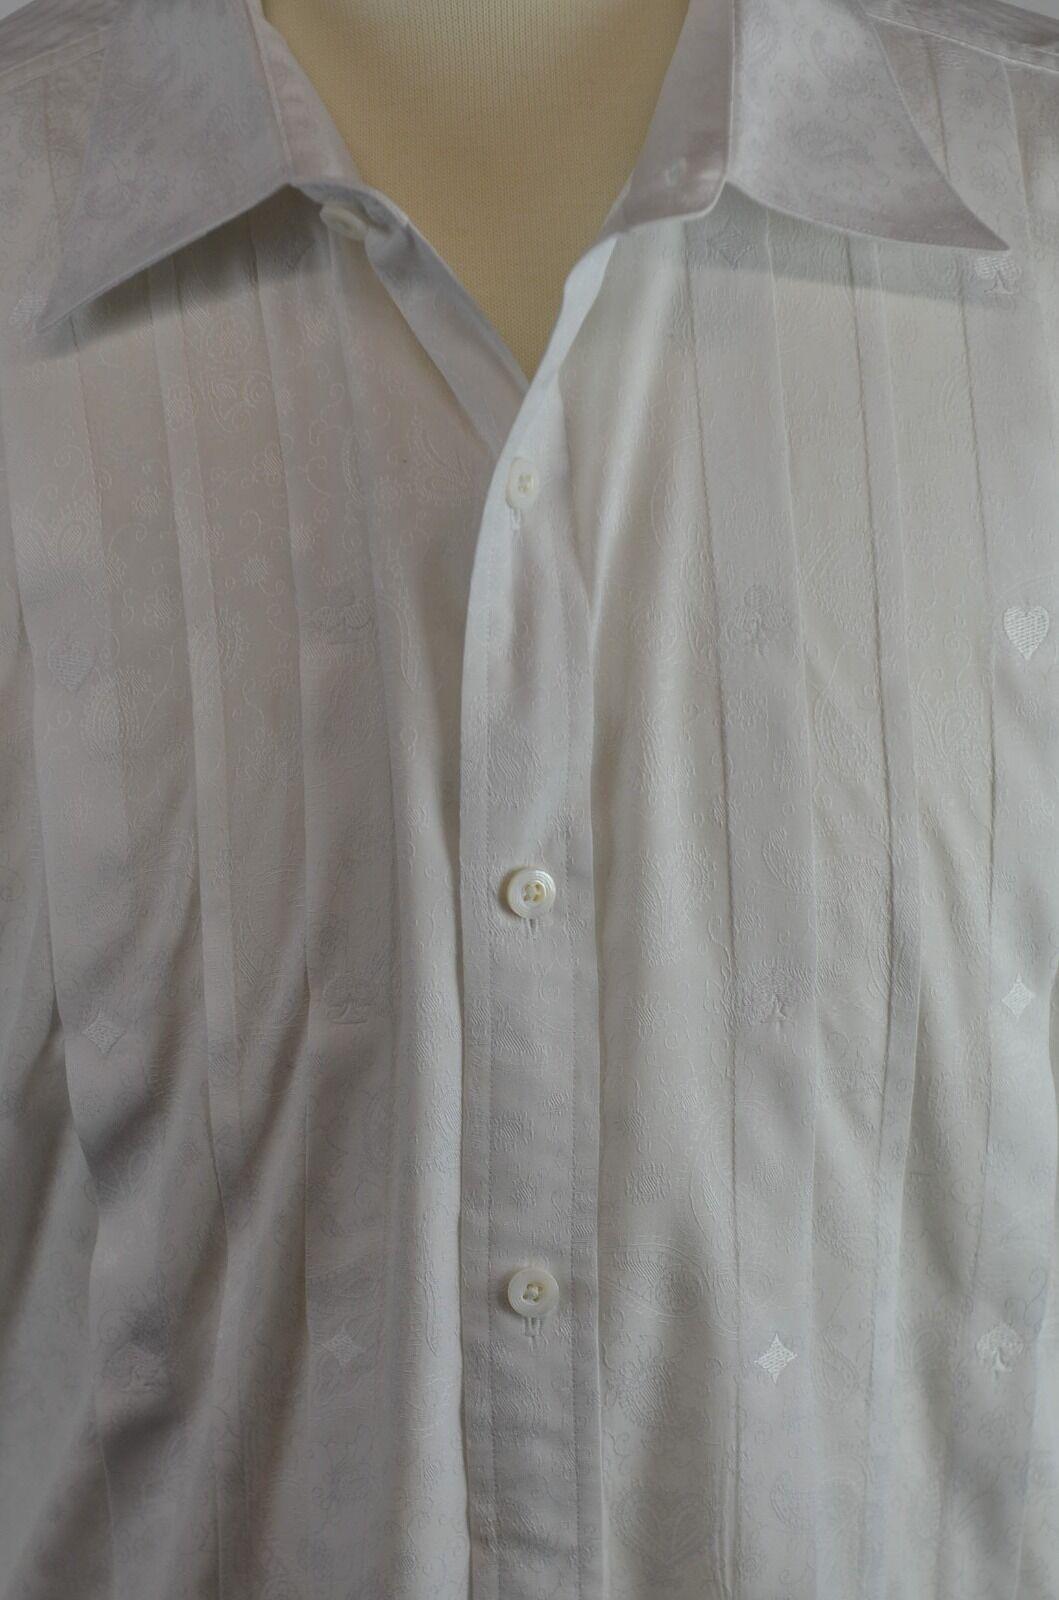 Nat Nast Men's Shirt  Size XL French Cuff Textured Shirt Very Cool